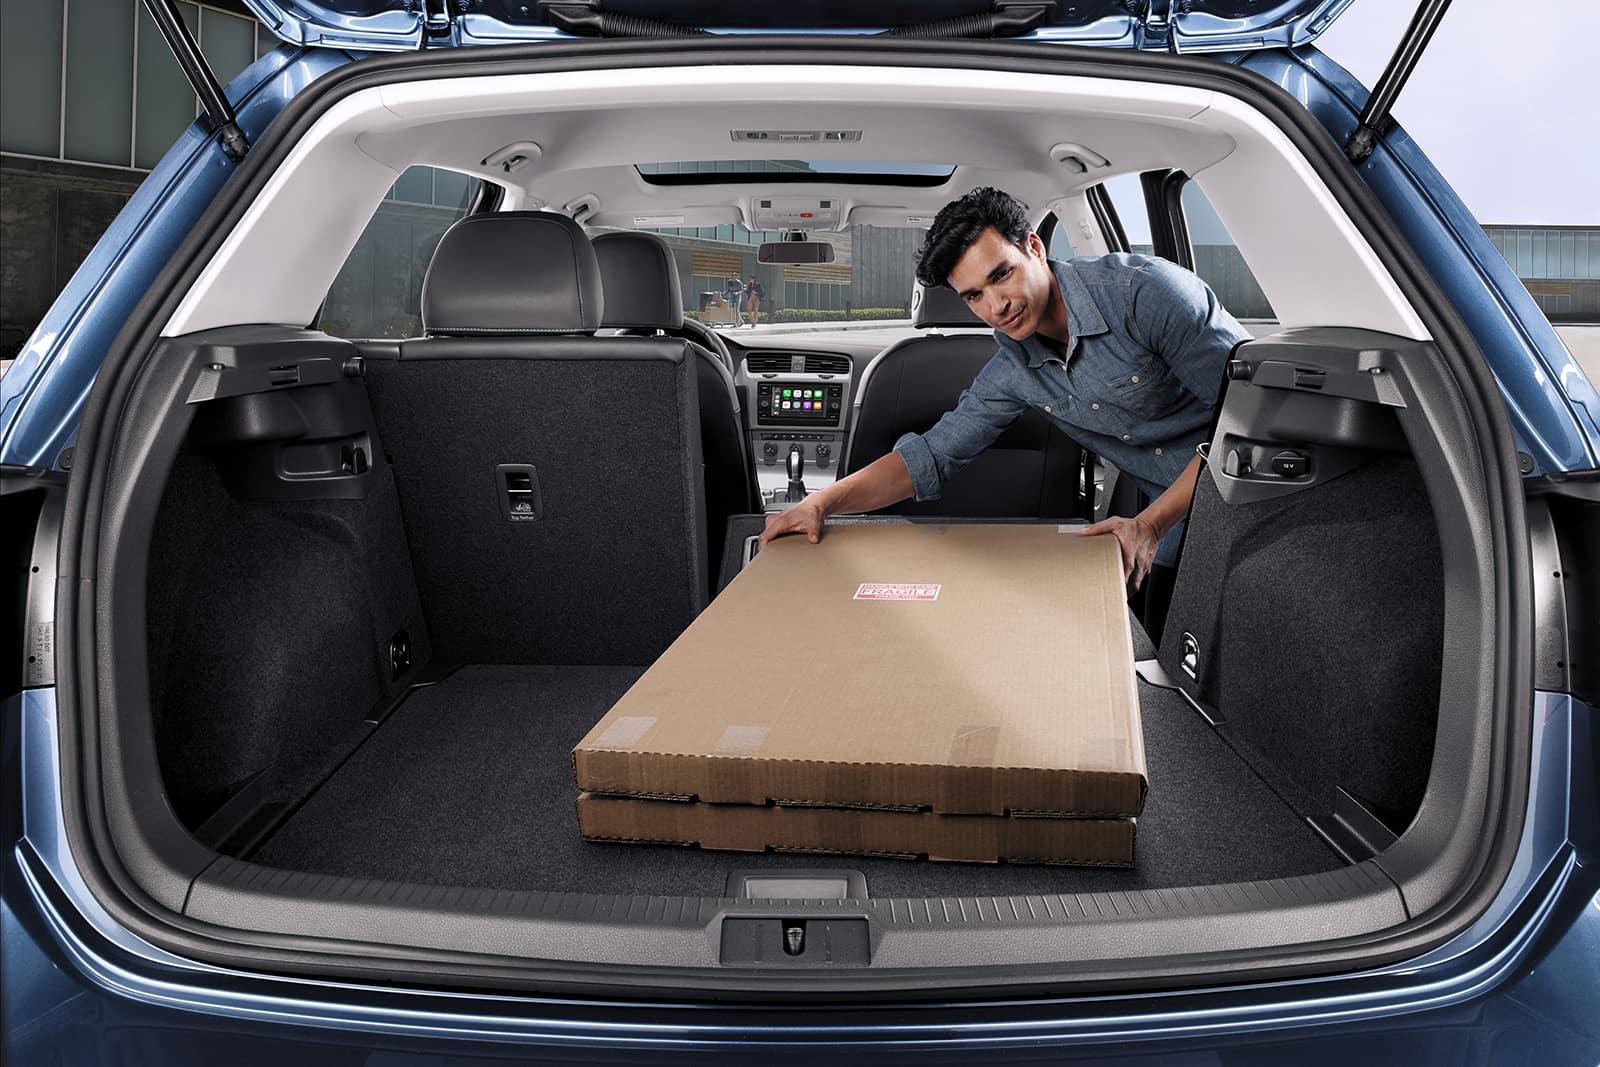 Golf Interior Cargo